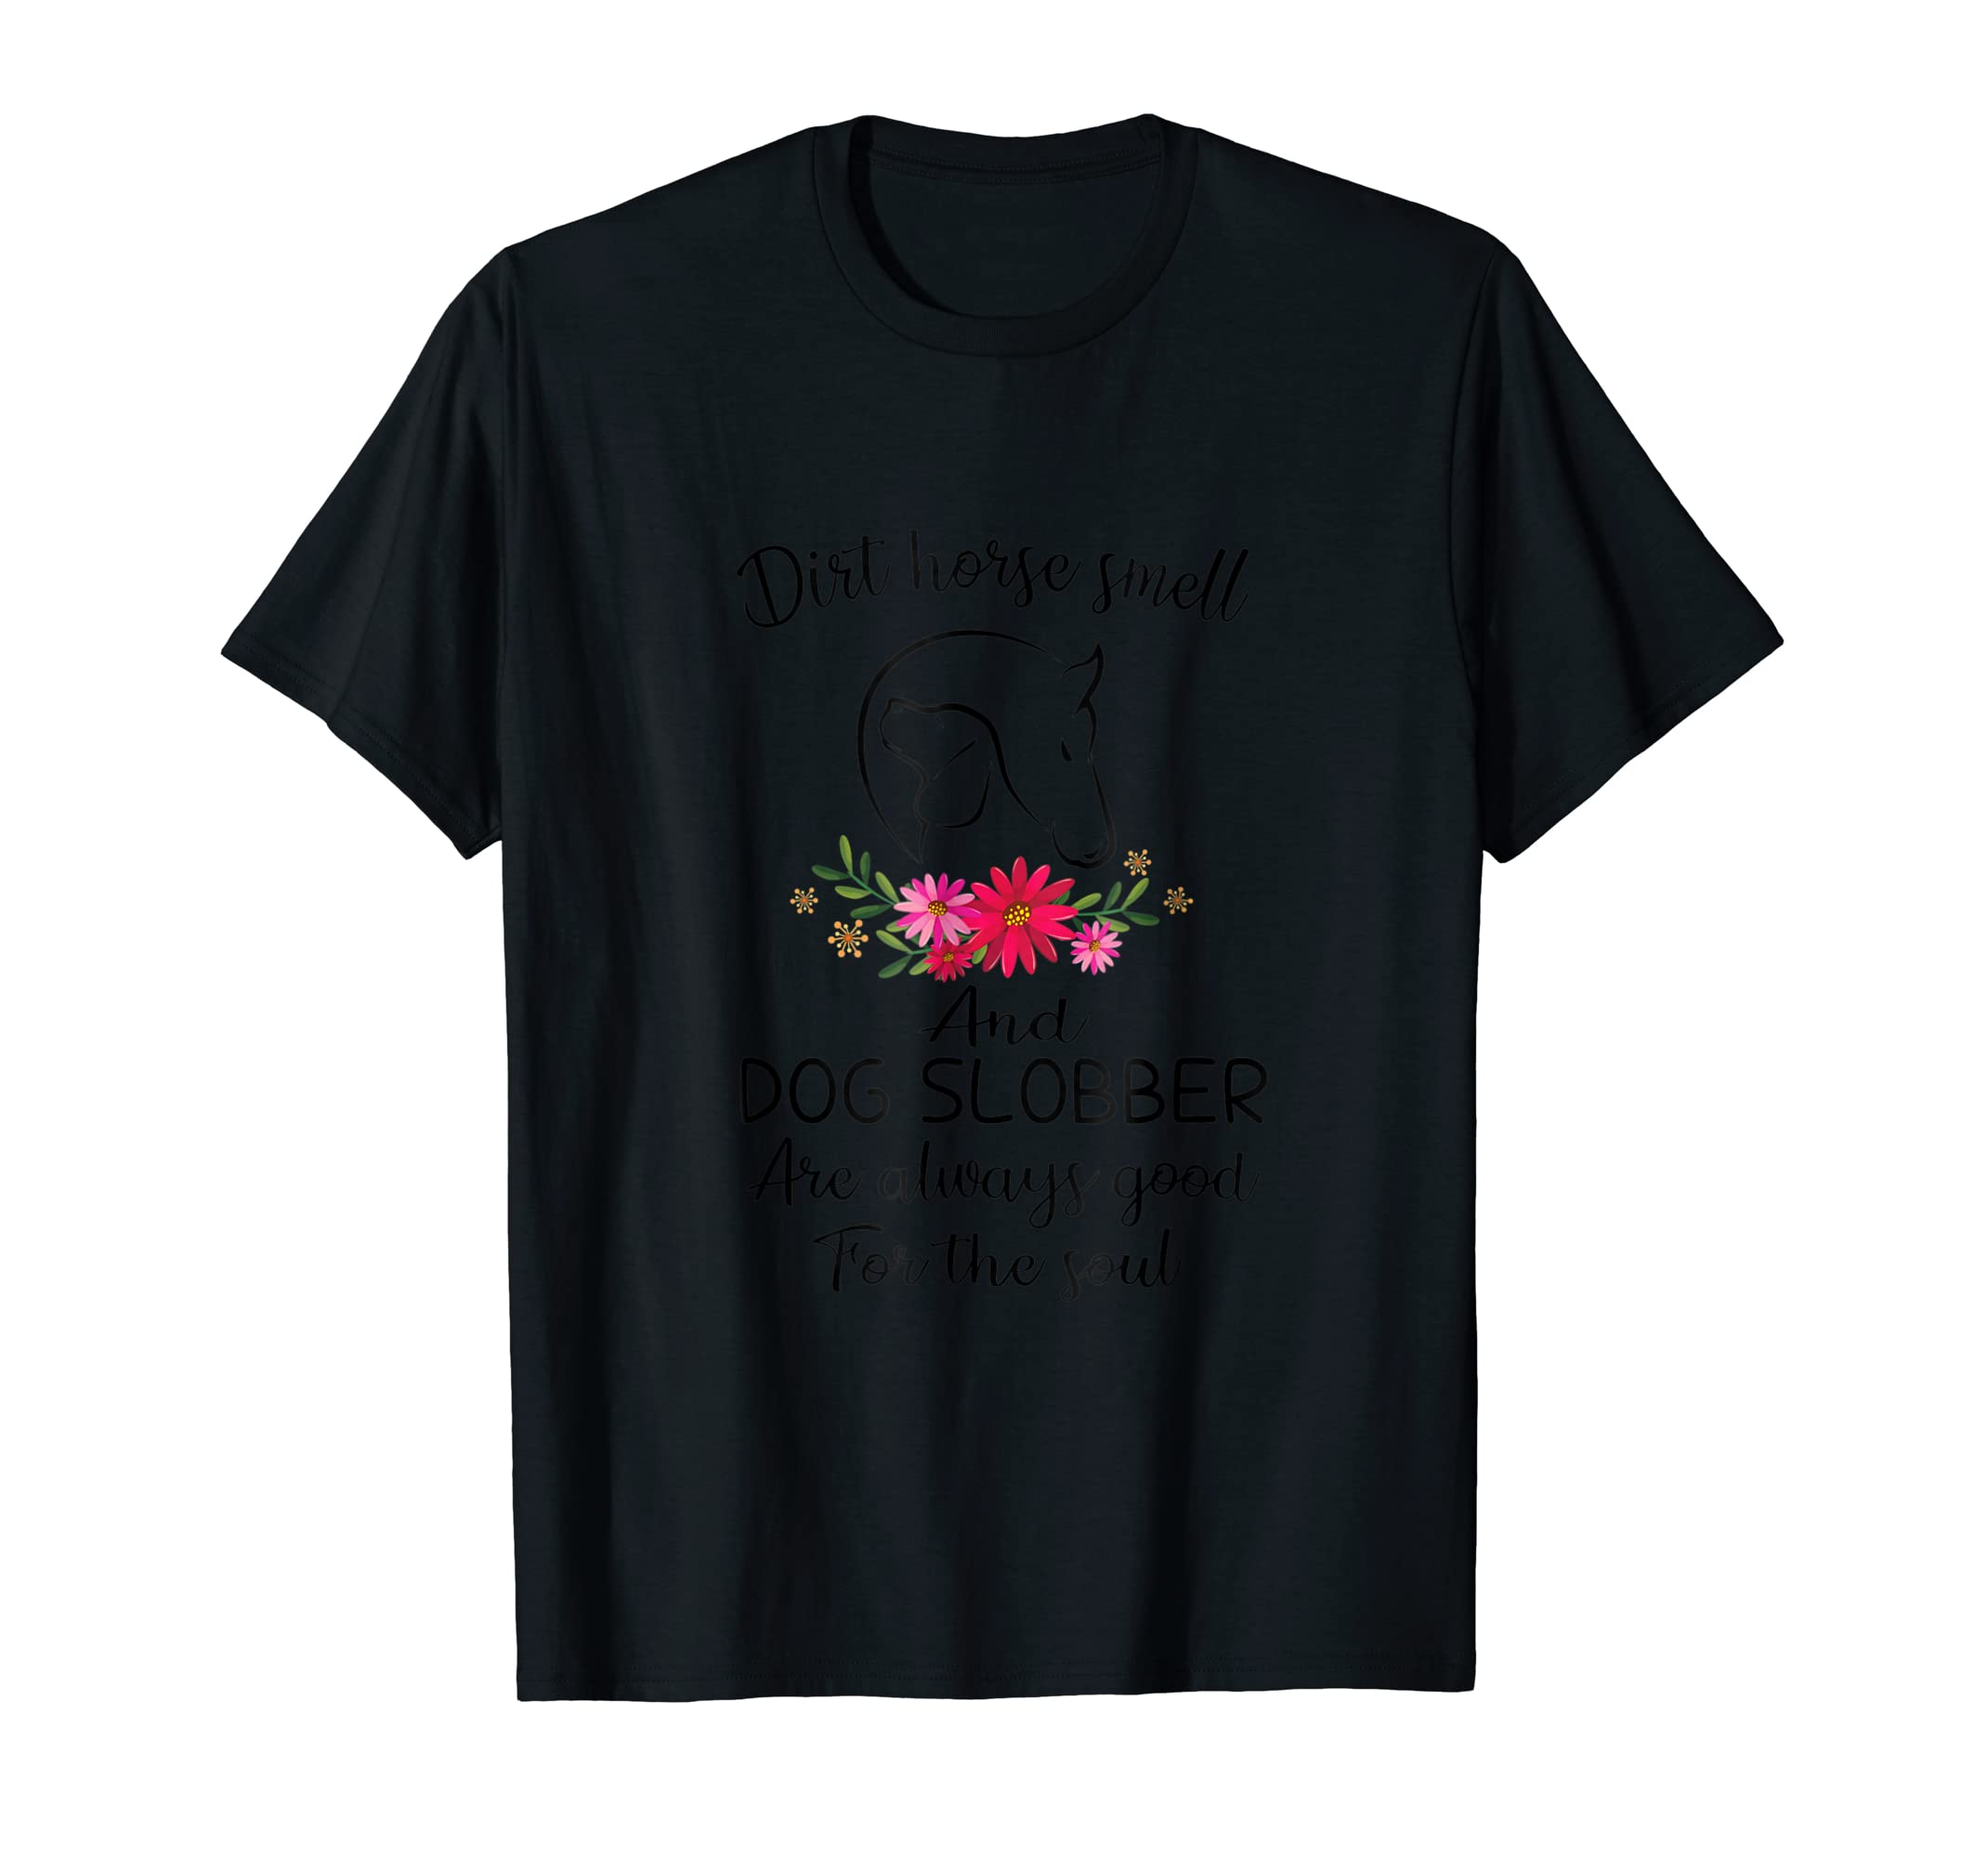 Dirt horse smell and dog slobber tshirt Horse & Dog Lover-Men's T-Shirt-Black